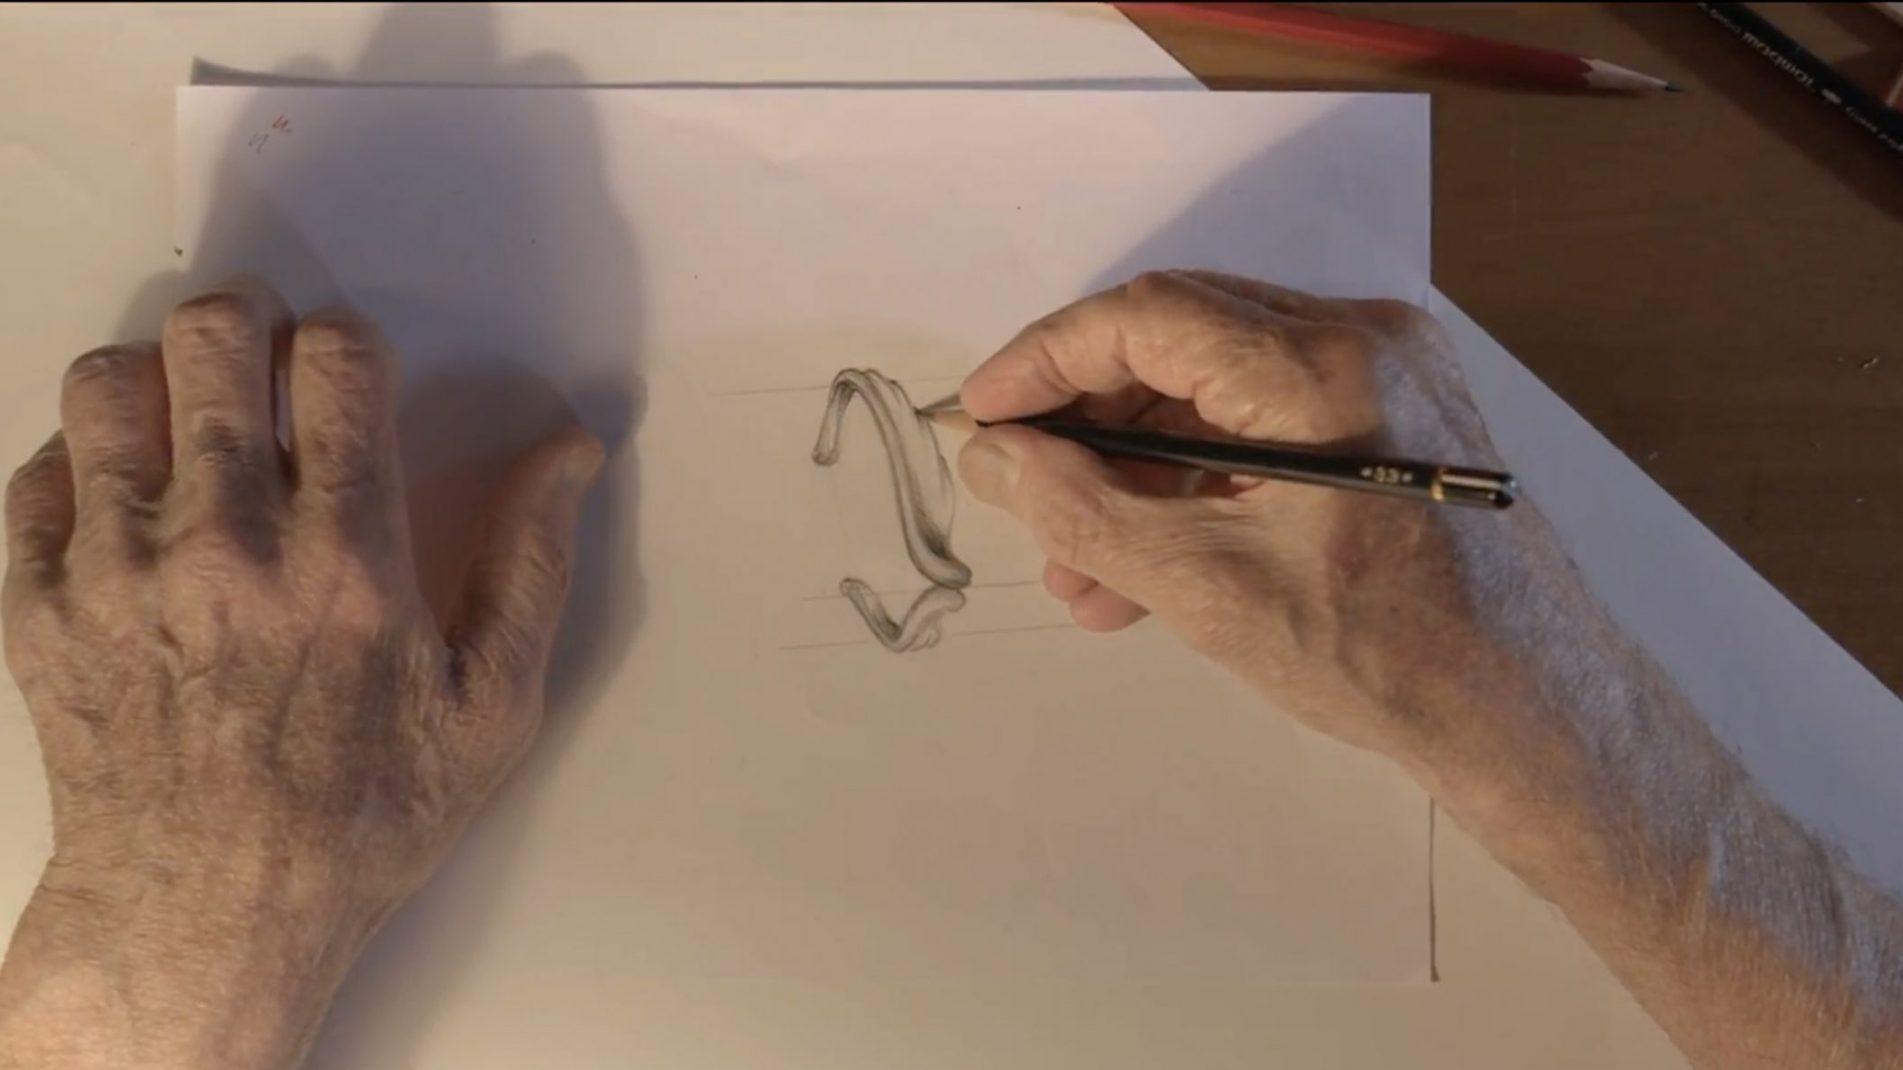 Minas Designs Pencil and Paper